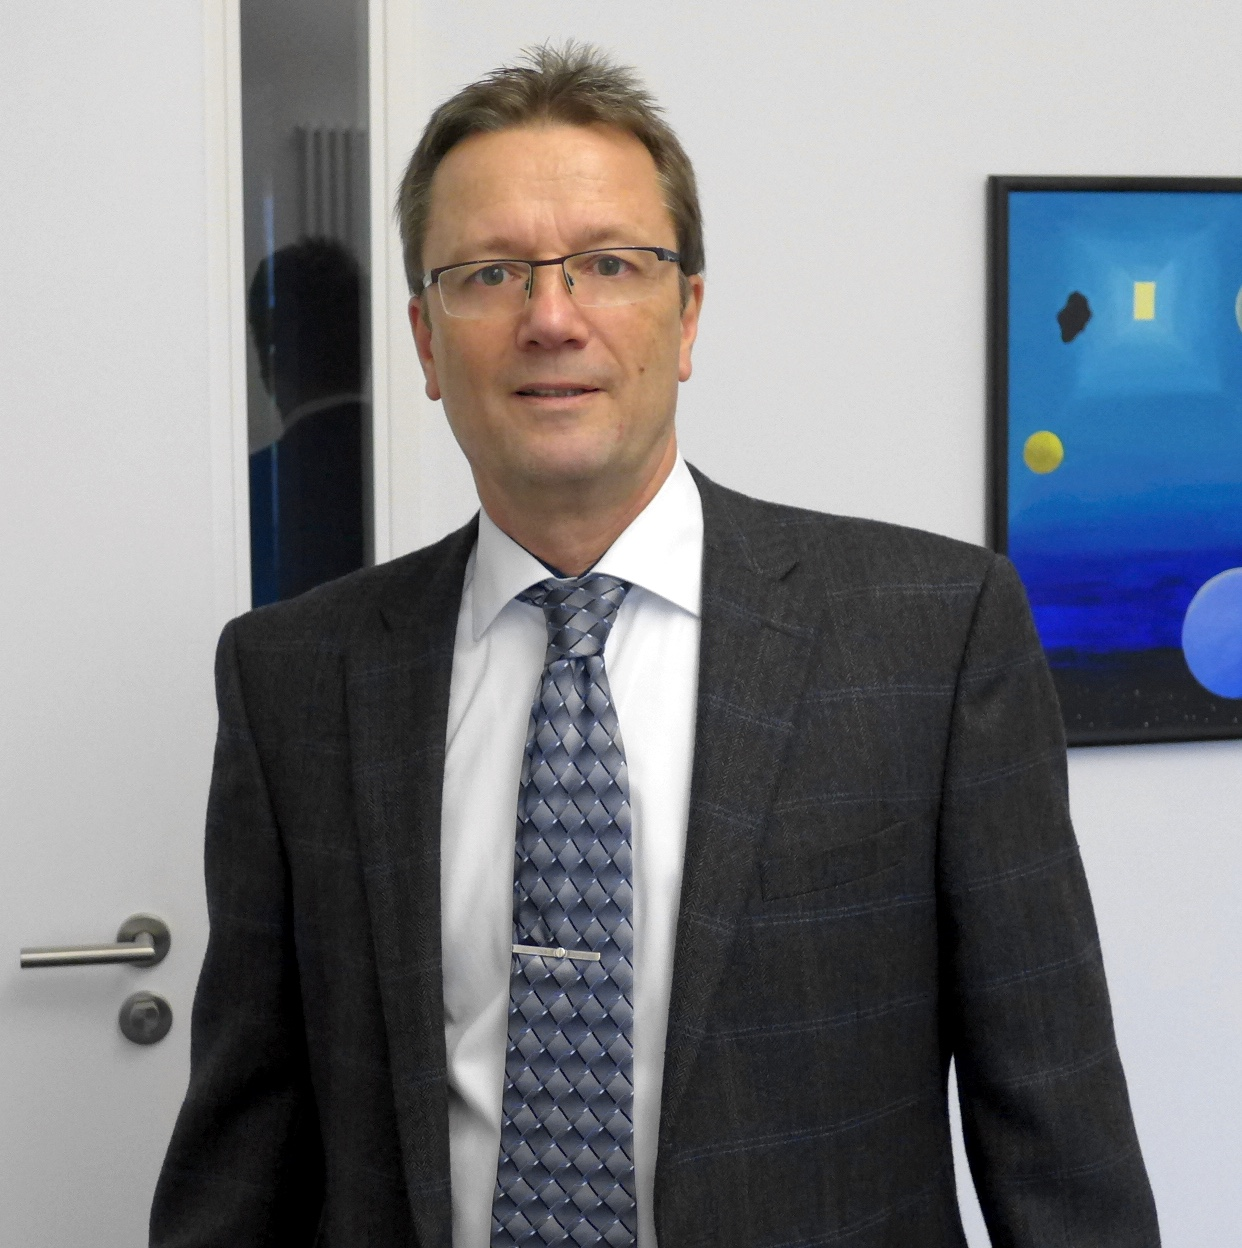 Geschäftsführer Martin Paulus